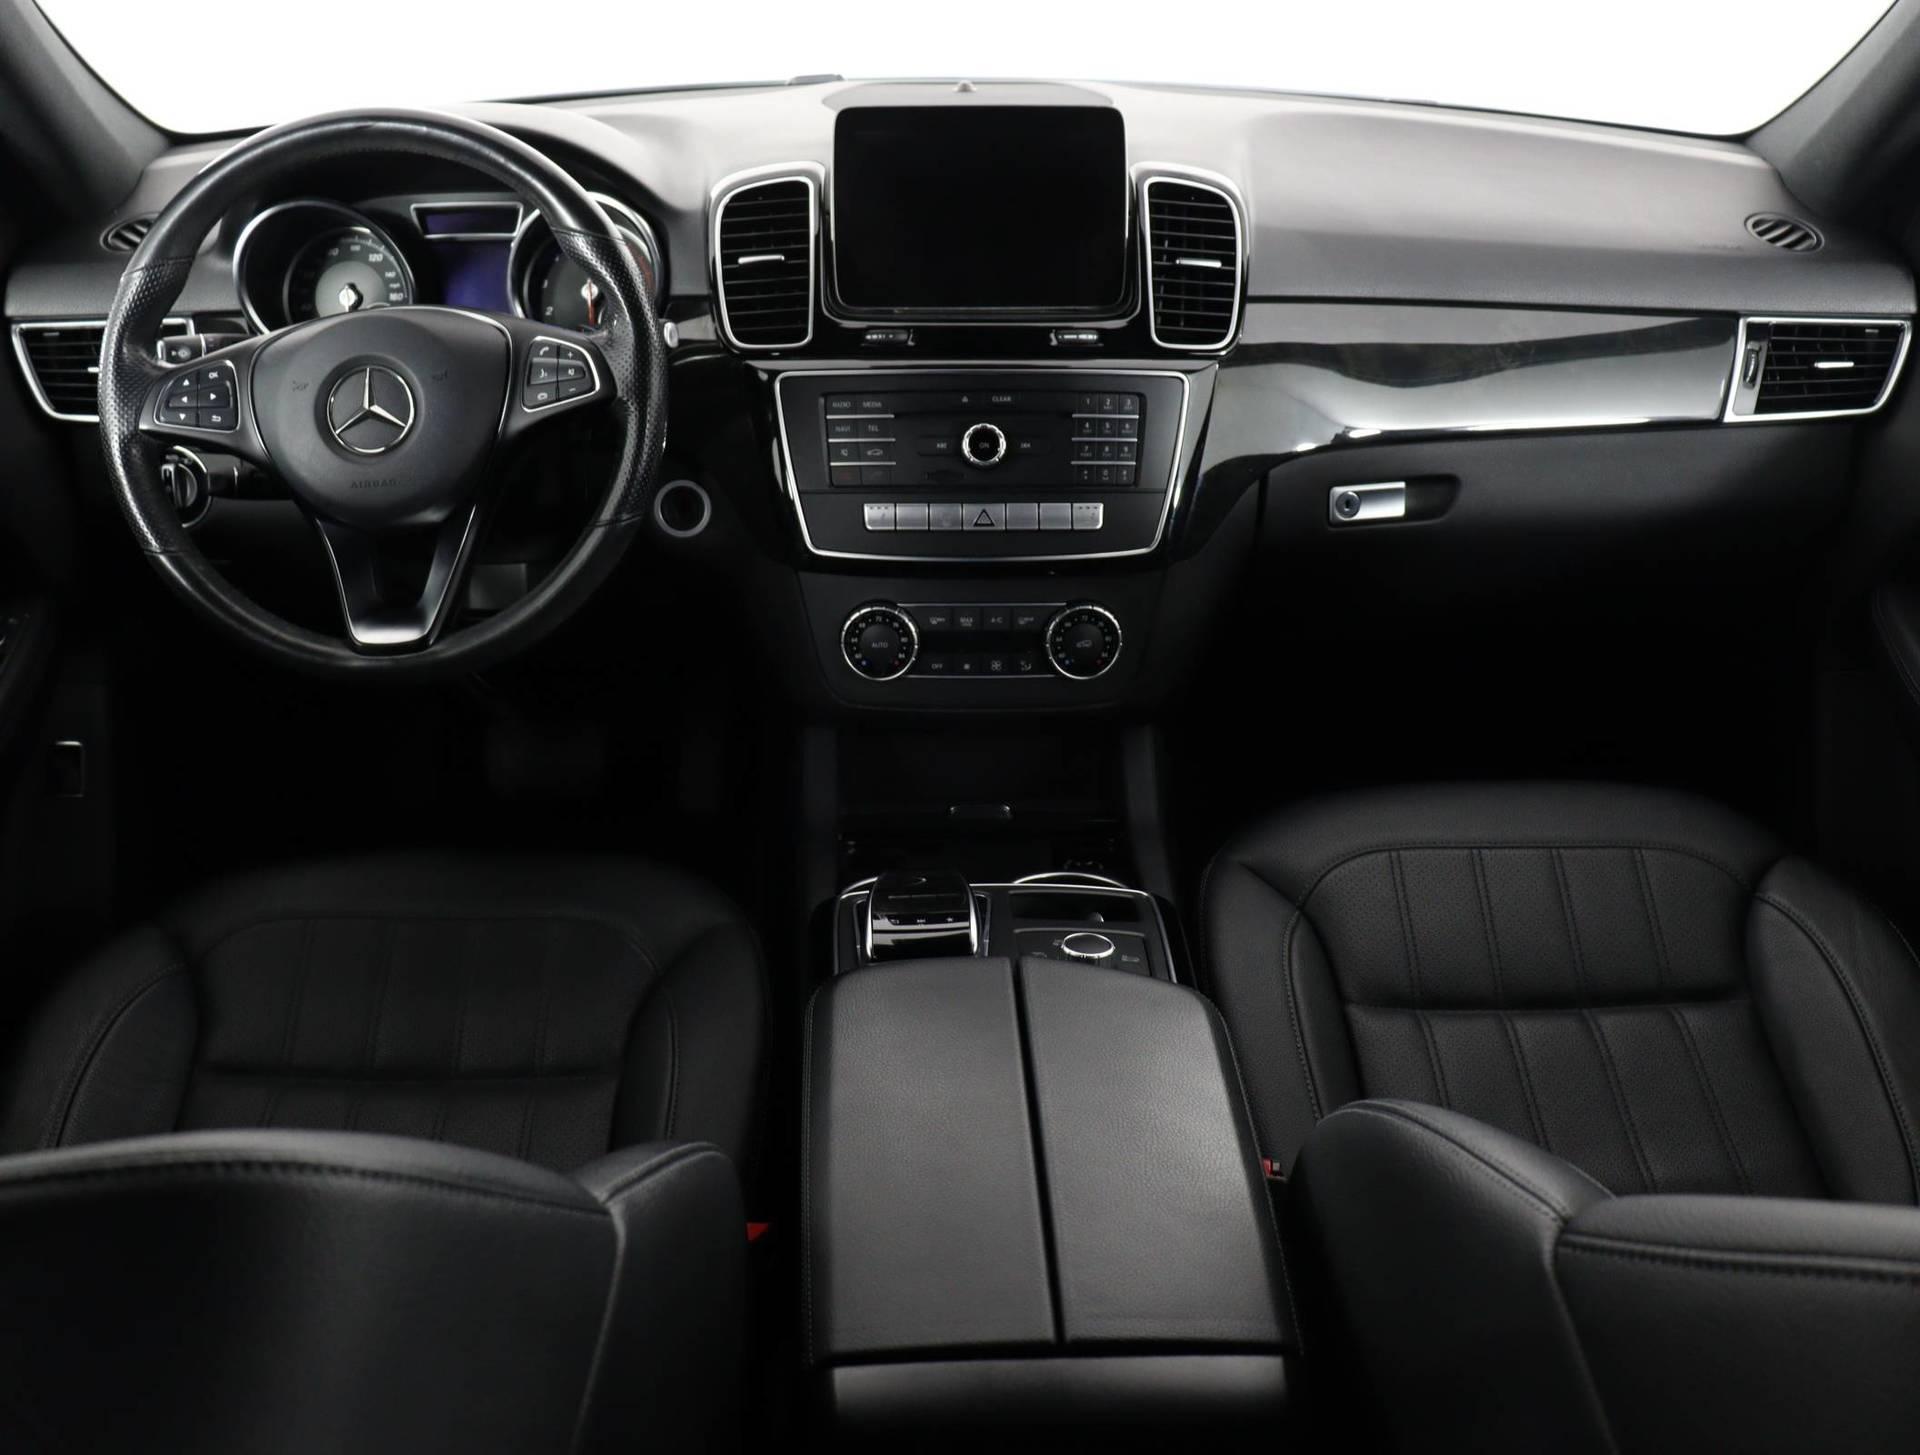 used vehicle - SUV MERCEDES-BENZ GLE 2018